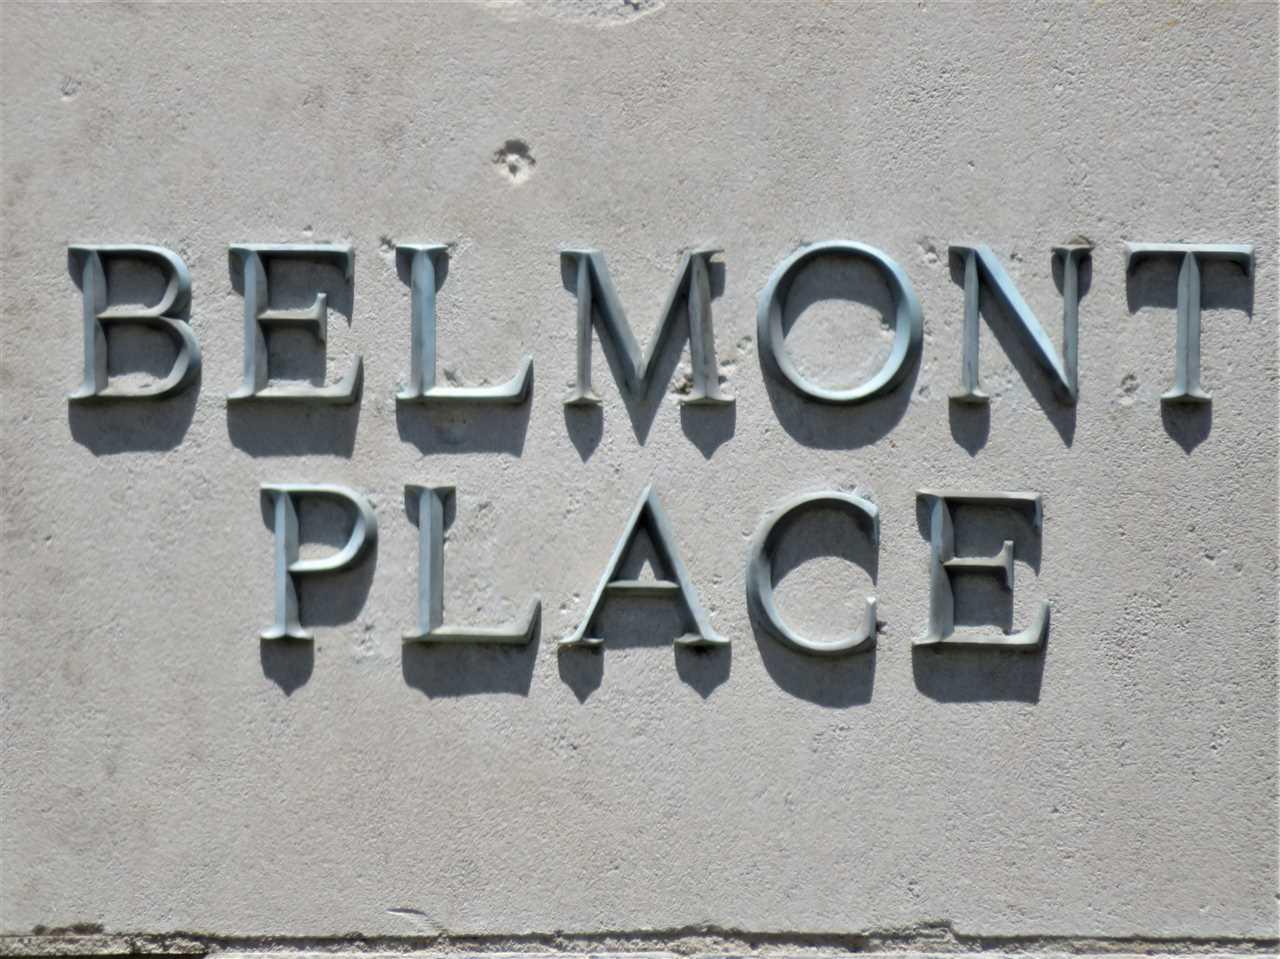 134 N Belmont Ave, Wichita, KS 67208